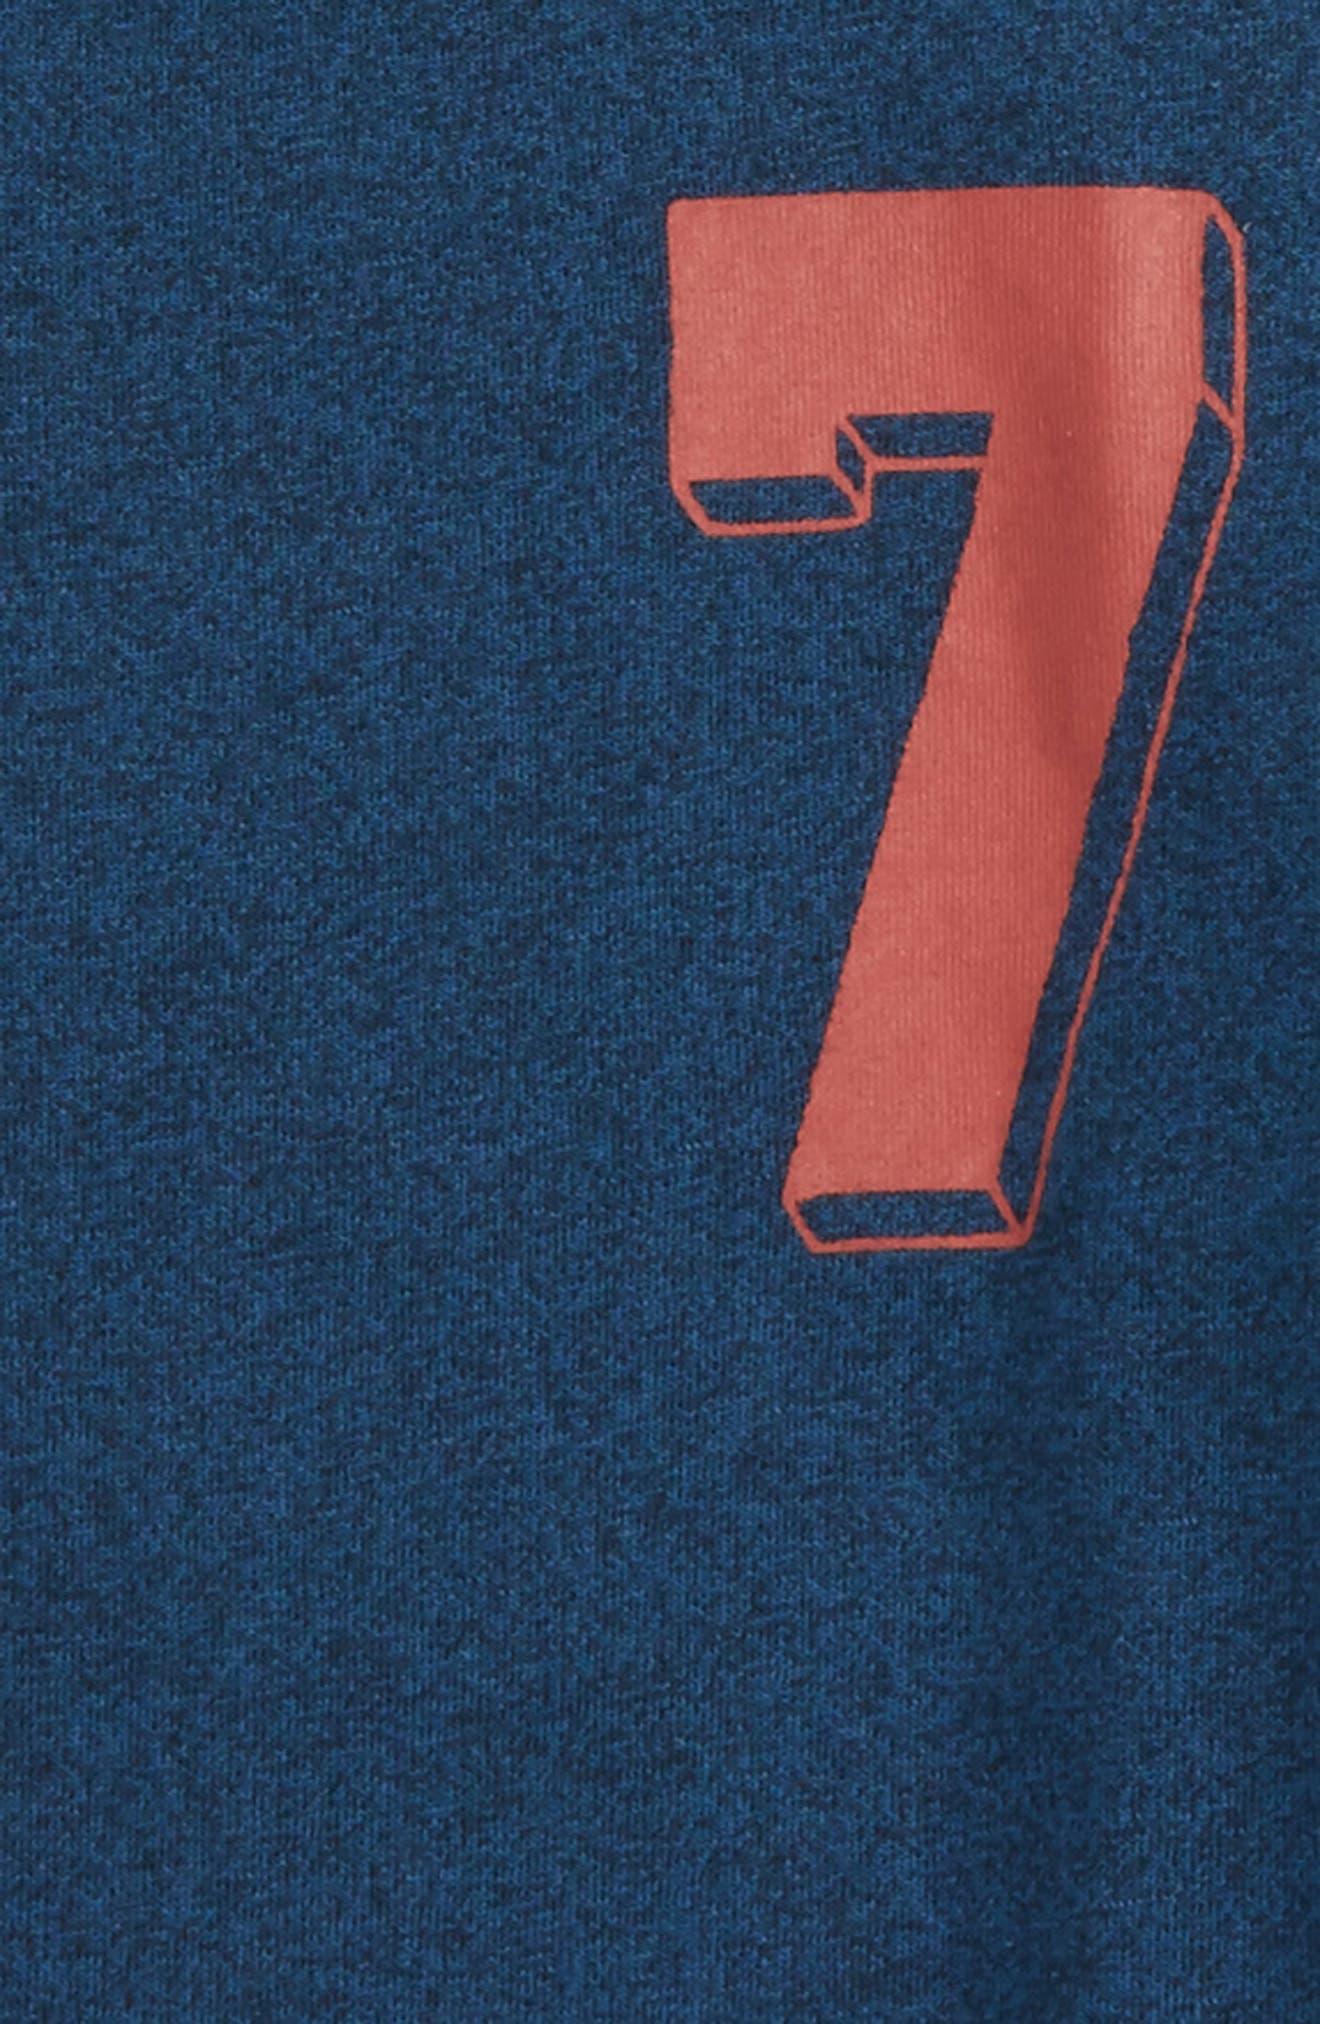 Alternate Image 2  - Tucker + Tate Pieced Sleeve T-Shirt (Toddler Boys & Little Boys)